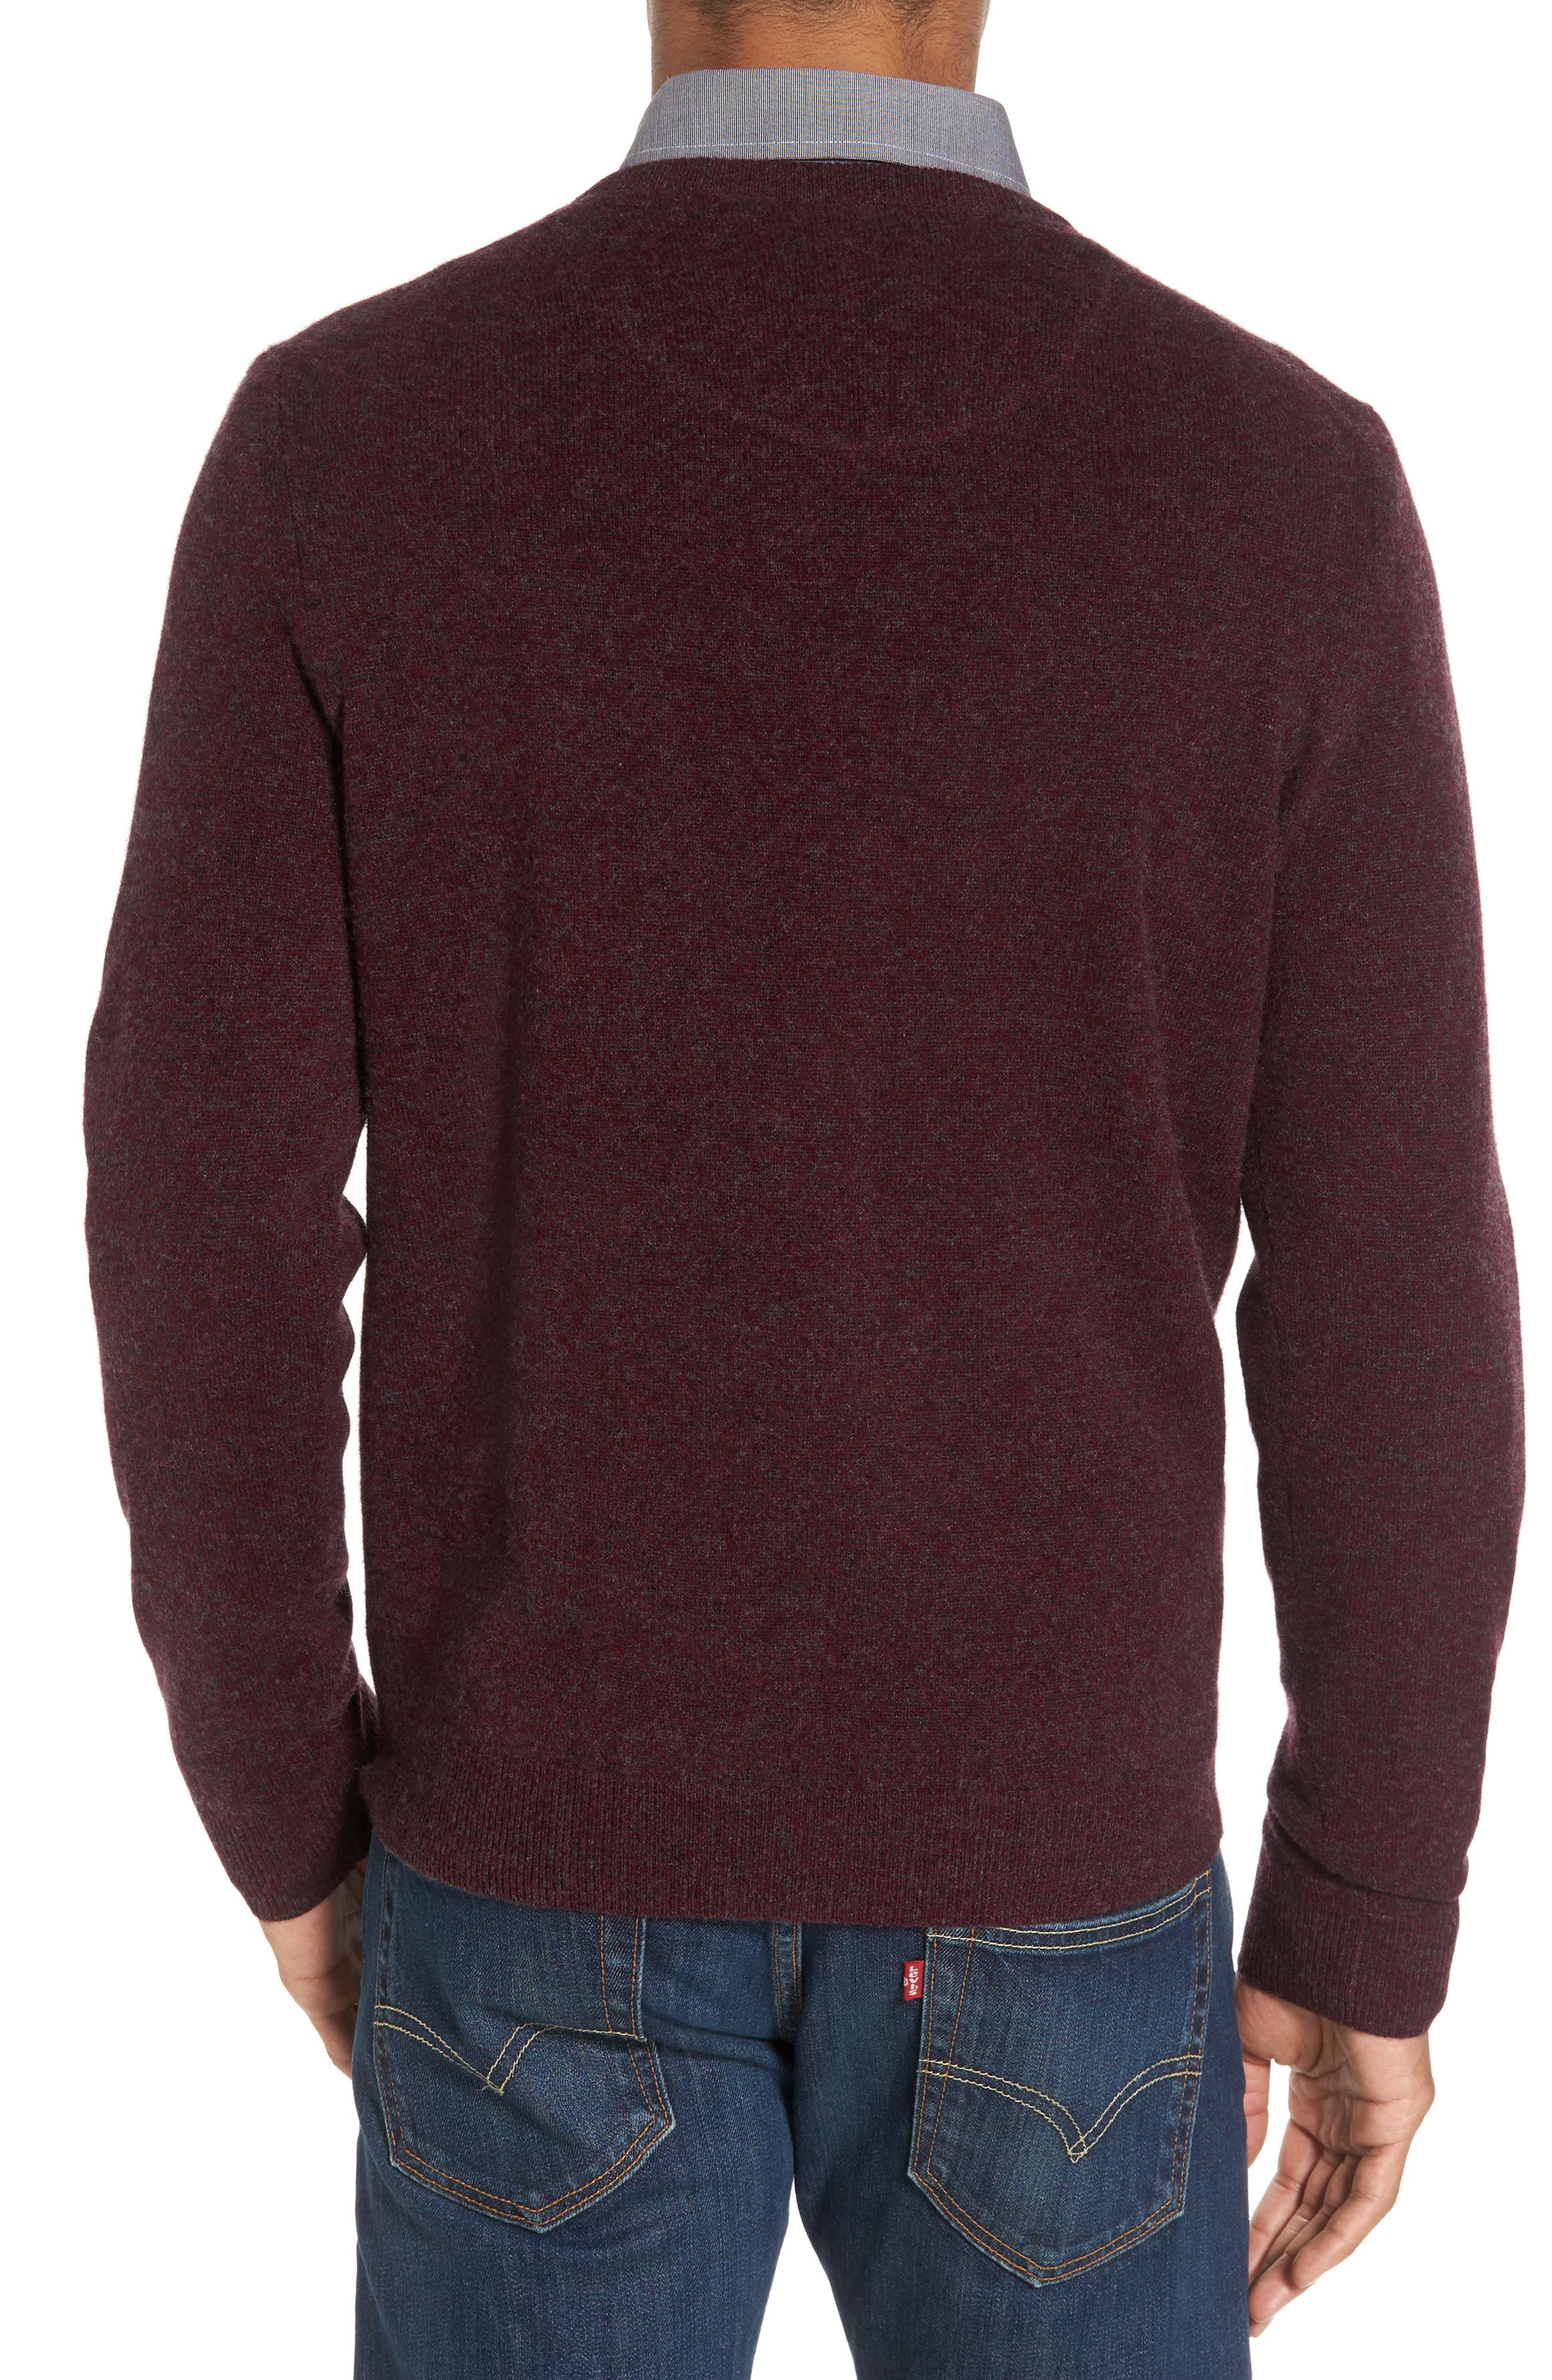 Cashmere V-Neck Sweater,                             Alternate thumbnail 2, color,                             Burgundy Fudge